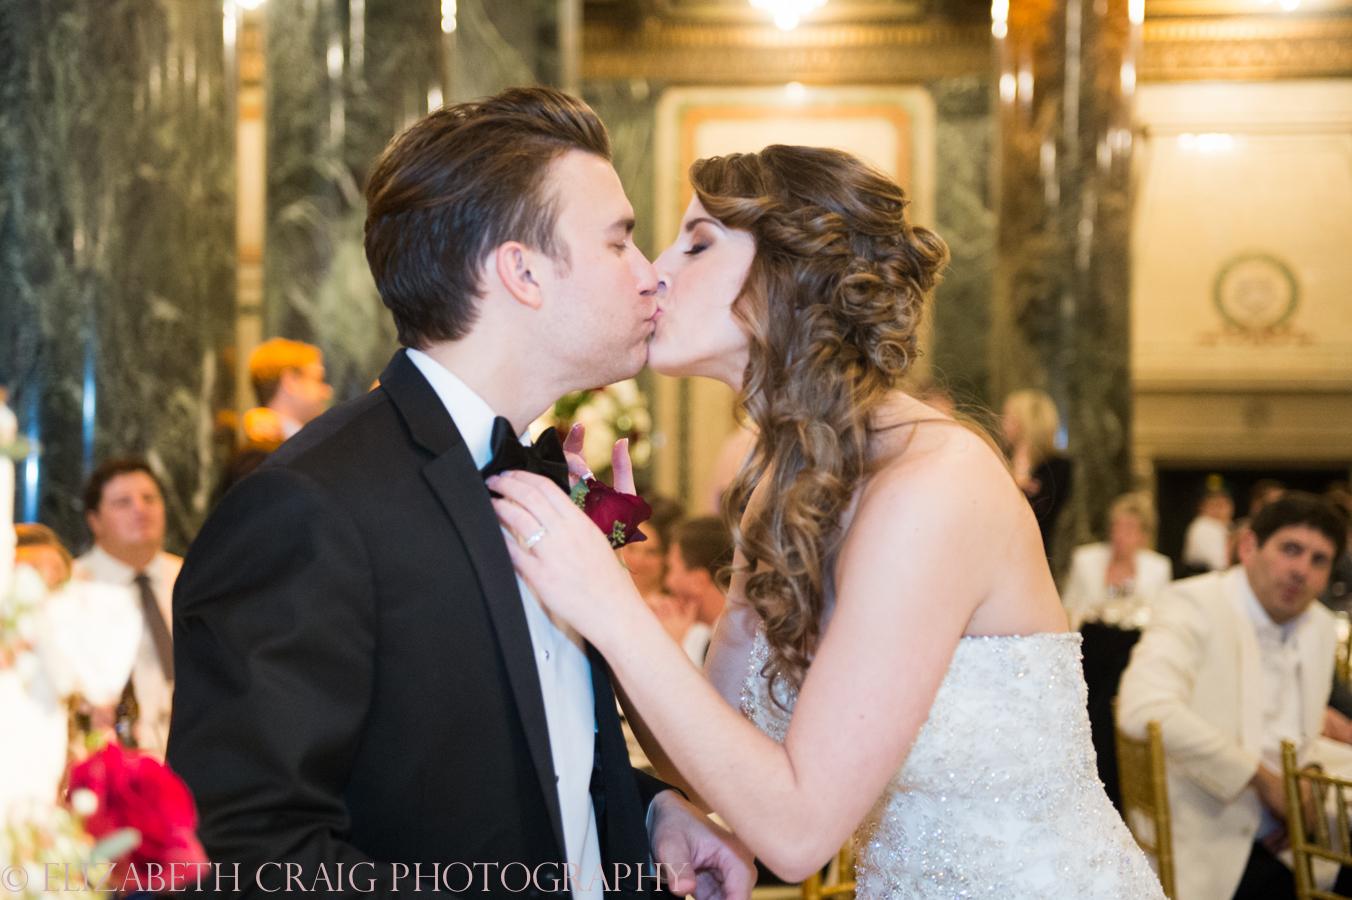 Carnegie Museum of Art Weddings | Elizabeth Craig Photography-0127